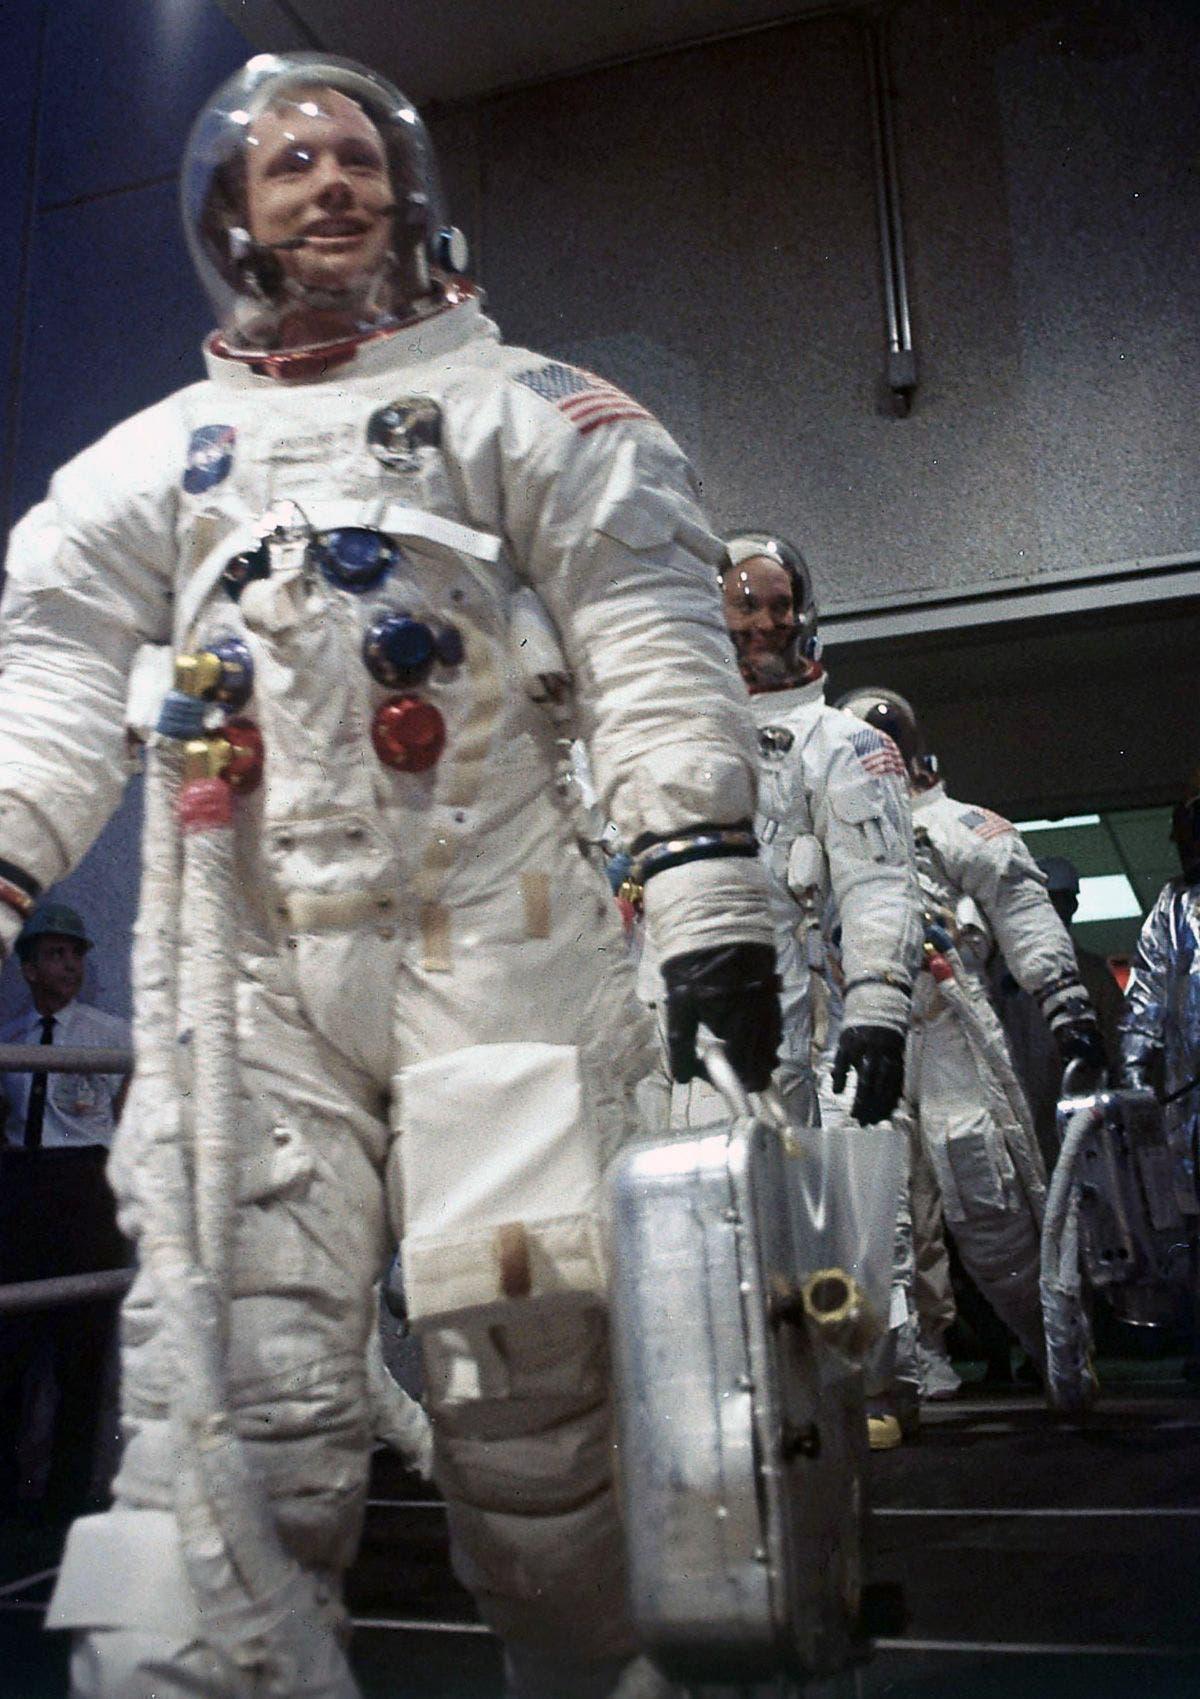 Créditos fotos: NASA/Orlando Sentinel/DR